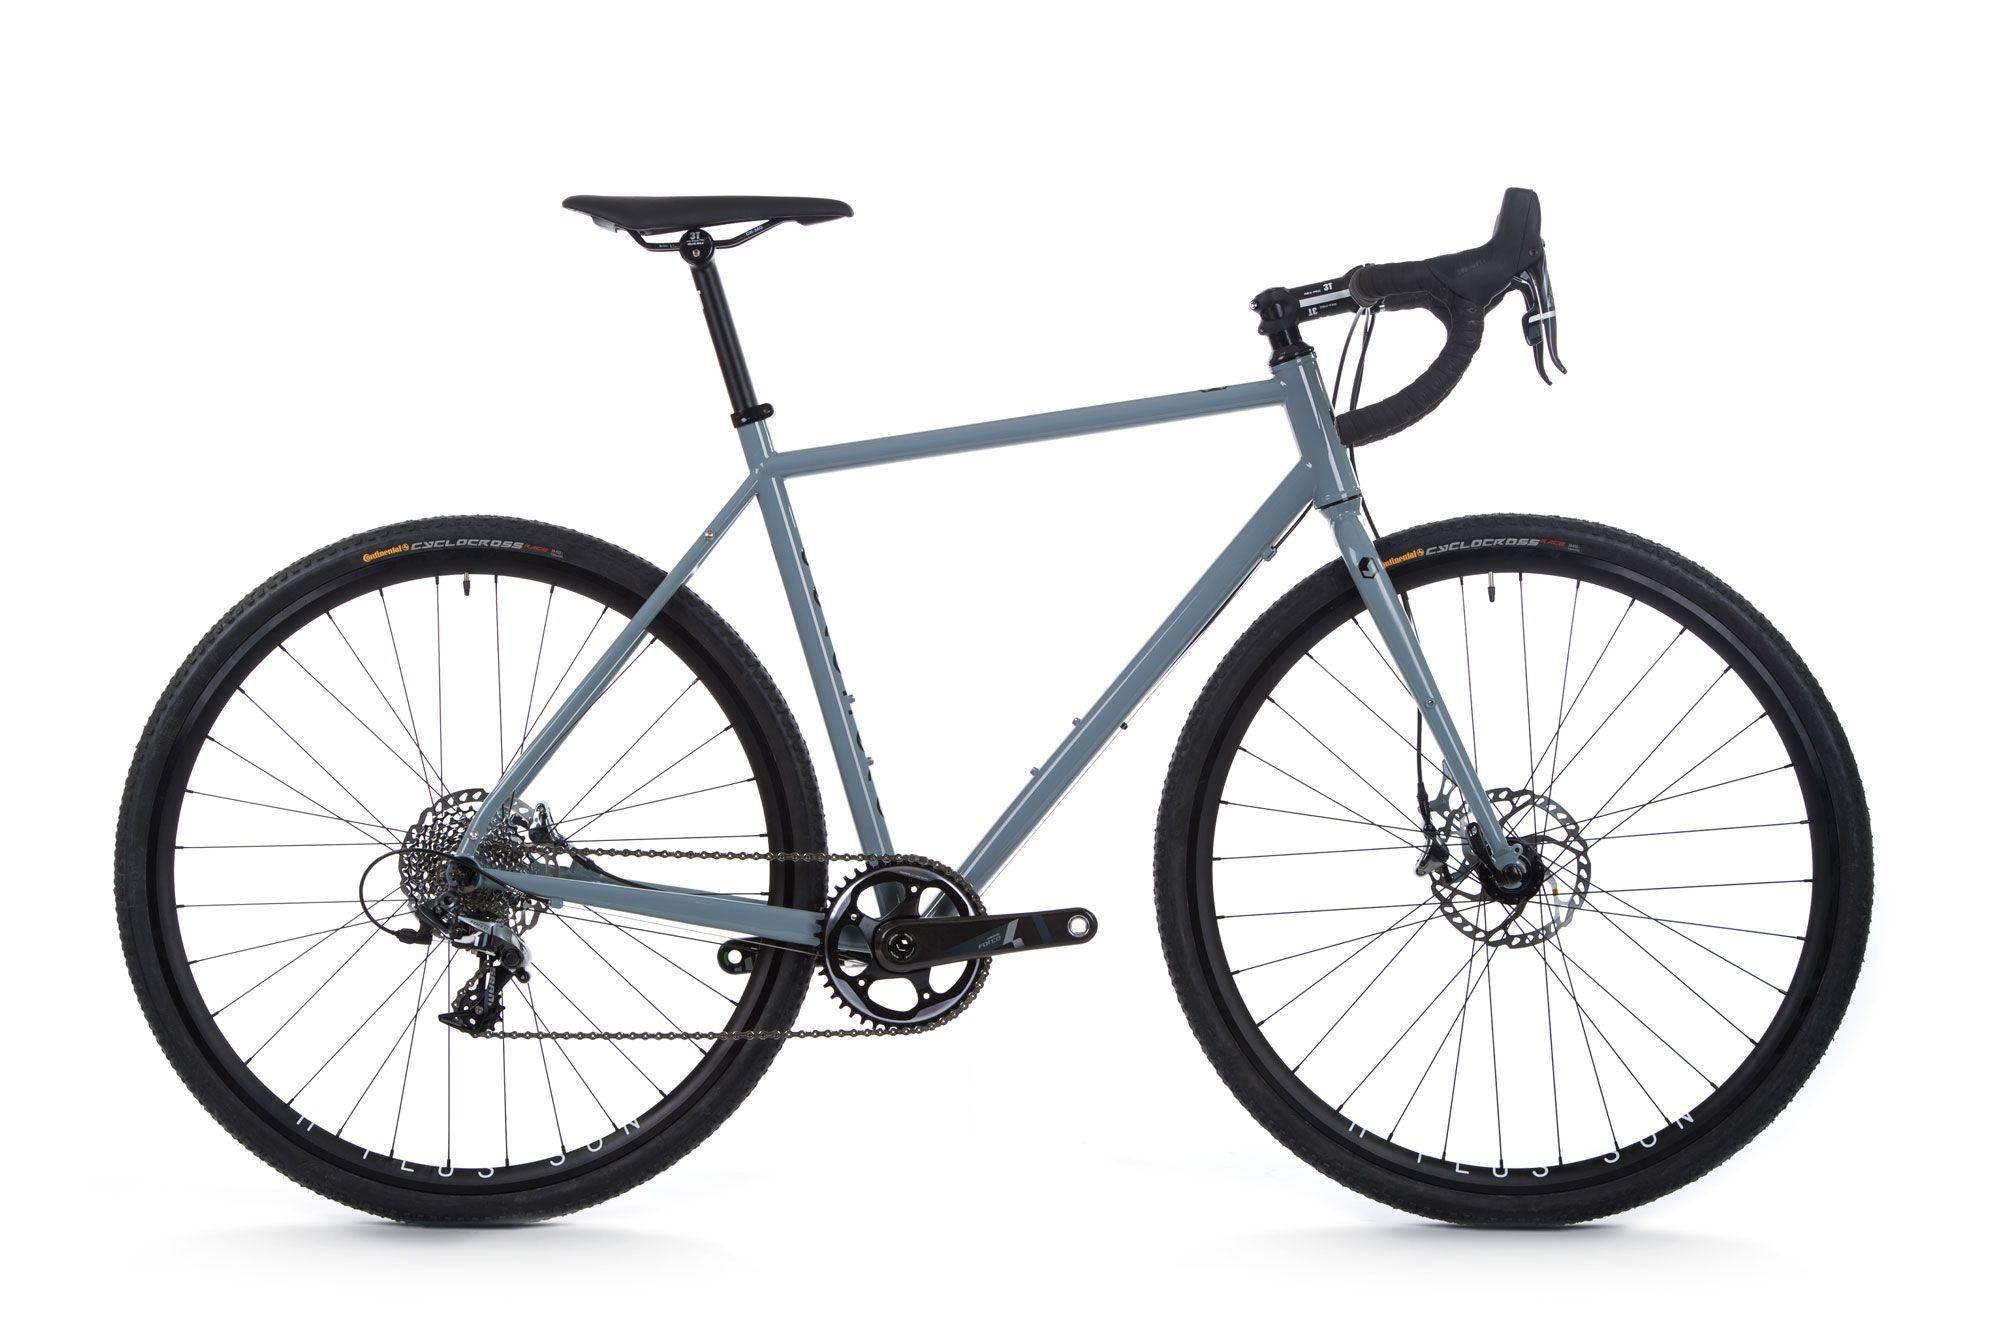 Veloheld Iconx In Fehgrau Fahrrad Ideen Radfahren Rennrad